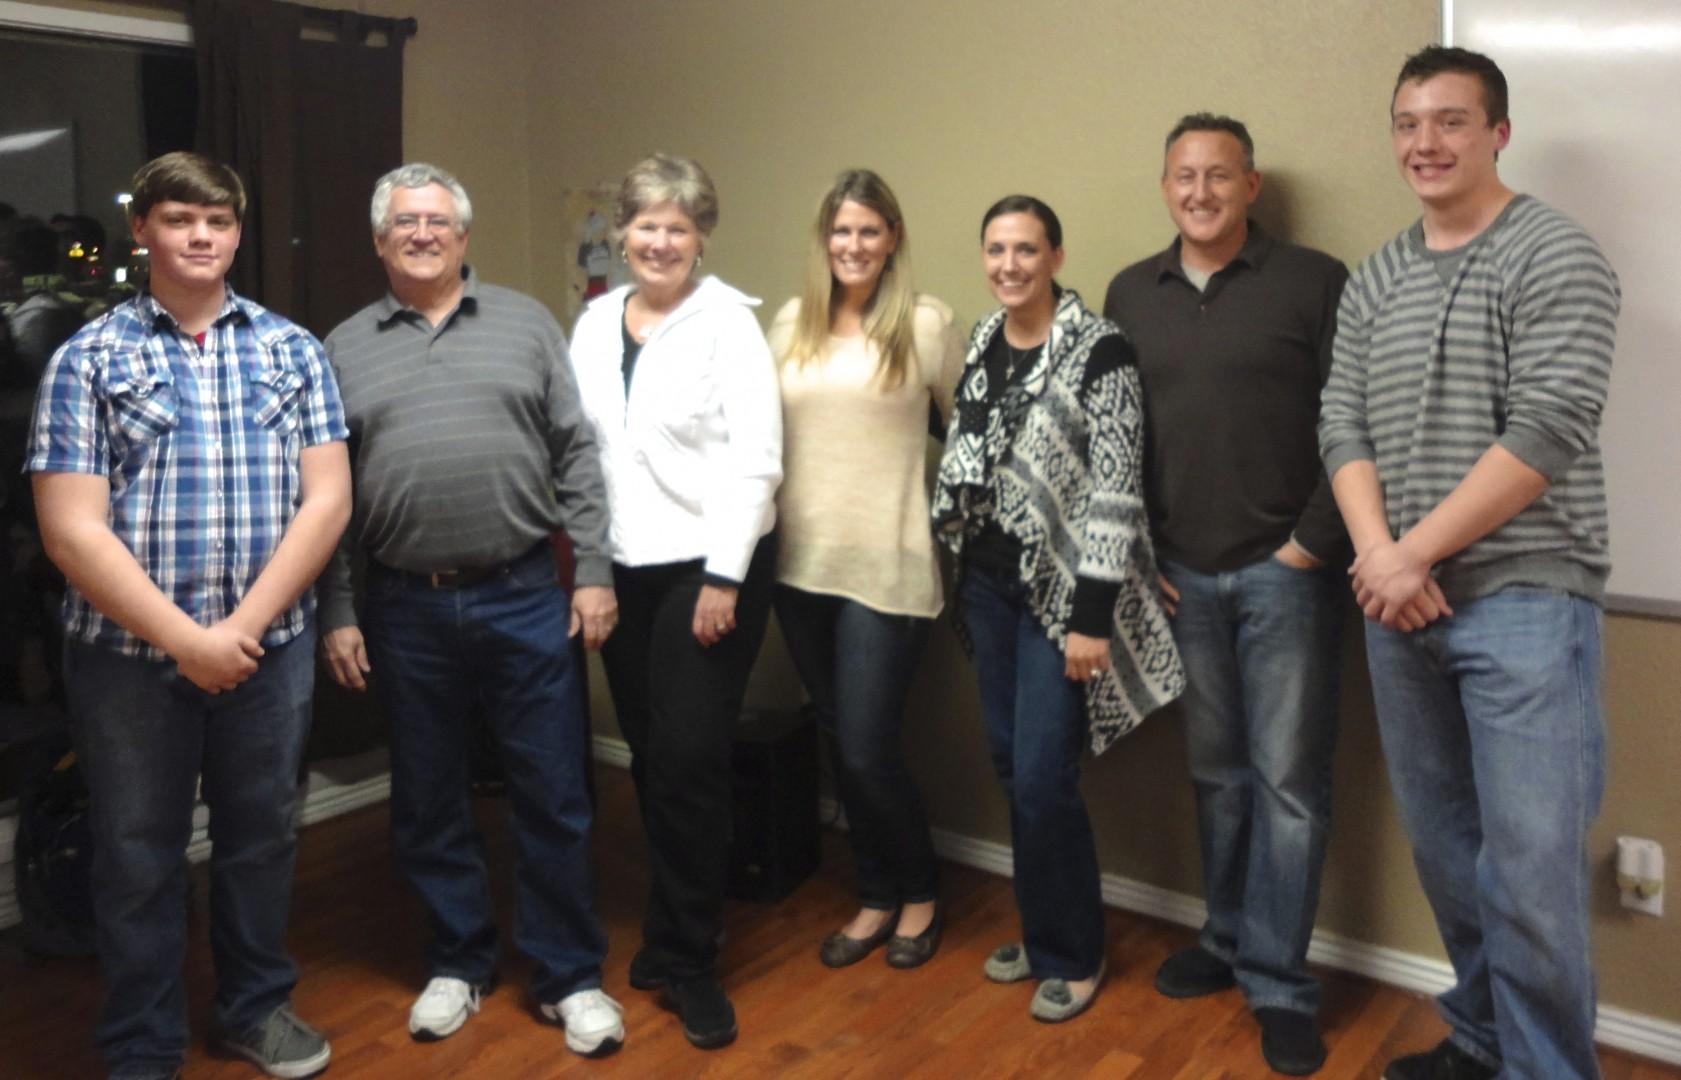 Cedar Bible Institute Organizers Hanan Pruitt, Tom & Janet Jackson, Natasha Tebbs, Melissa & Rob Bantum and Kole Dotson, Cedar City, Utah, Jan. 13, 2014 | Photo by Rhonda Tommer, St. George News